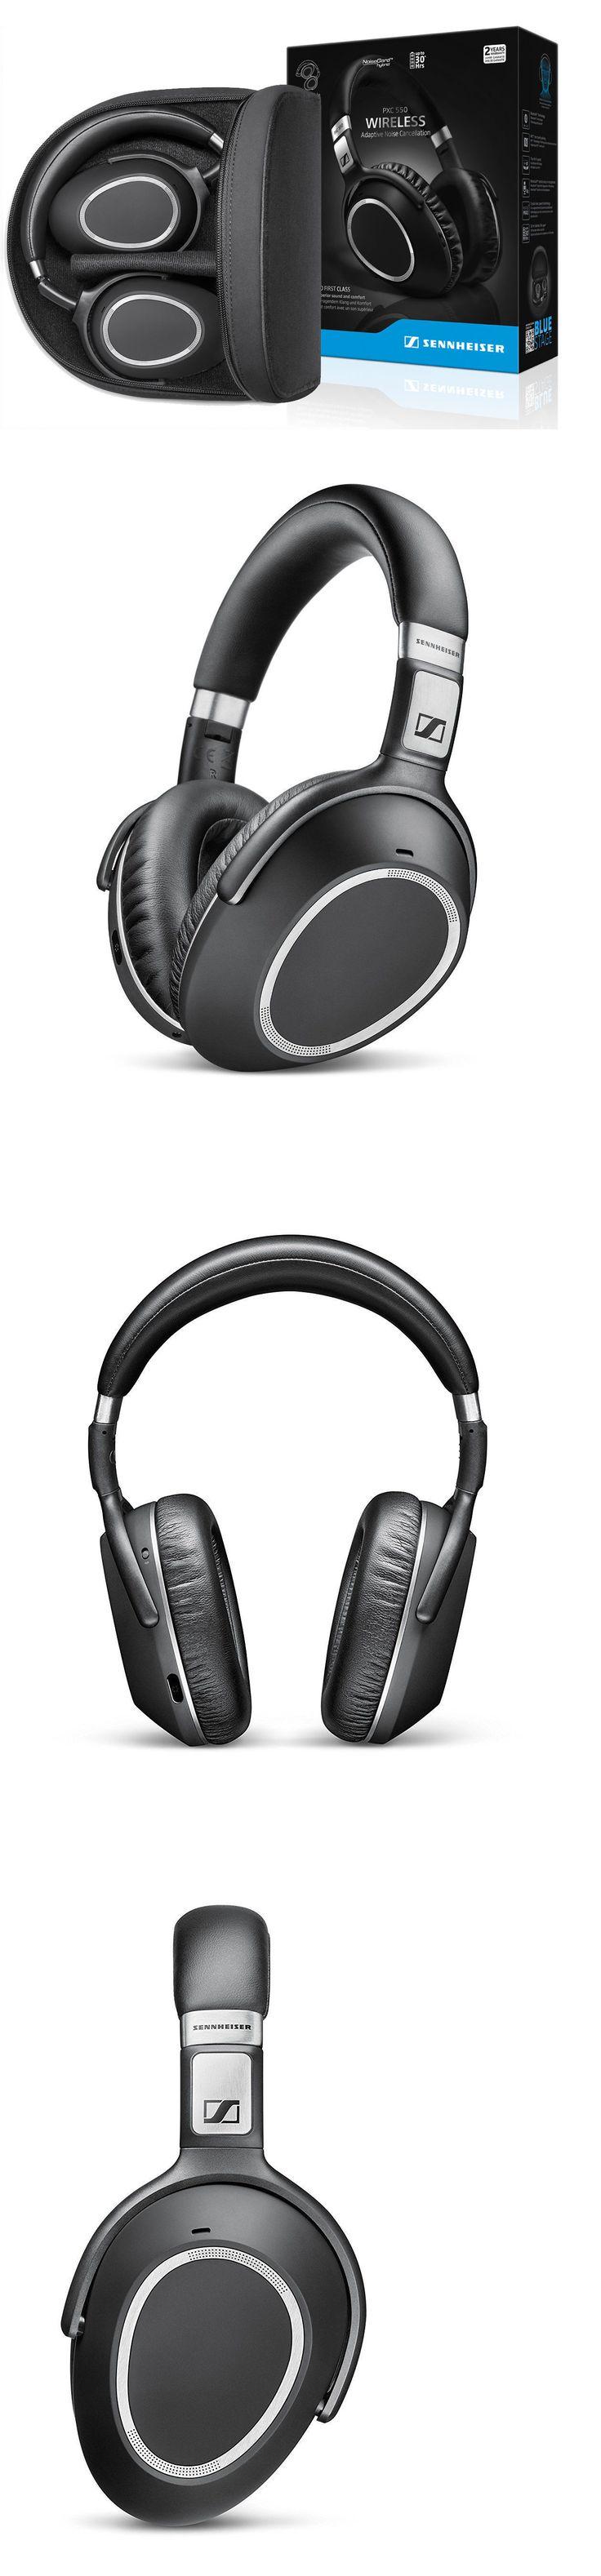 Headphones: Sennheiser Pxc 550 Bluetooth Wireless Noise Cancelling Headphone Headset W Case -> BUY IT NOW ONLY: $279 on eBay!